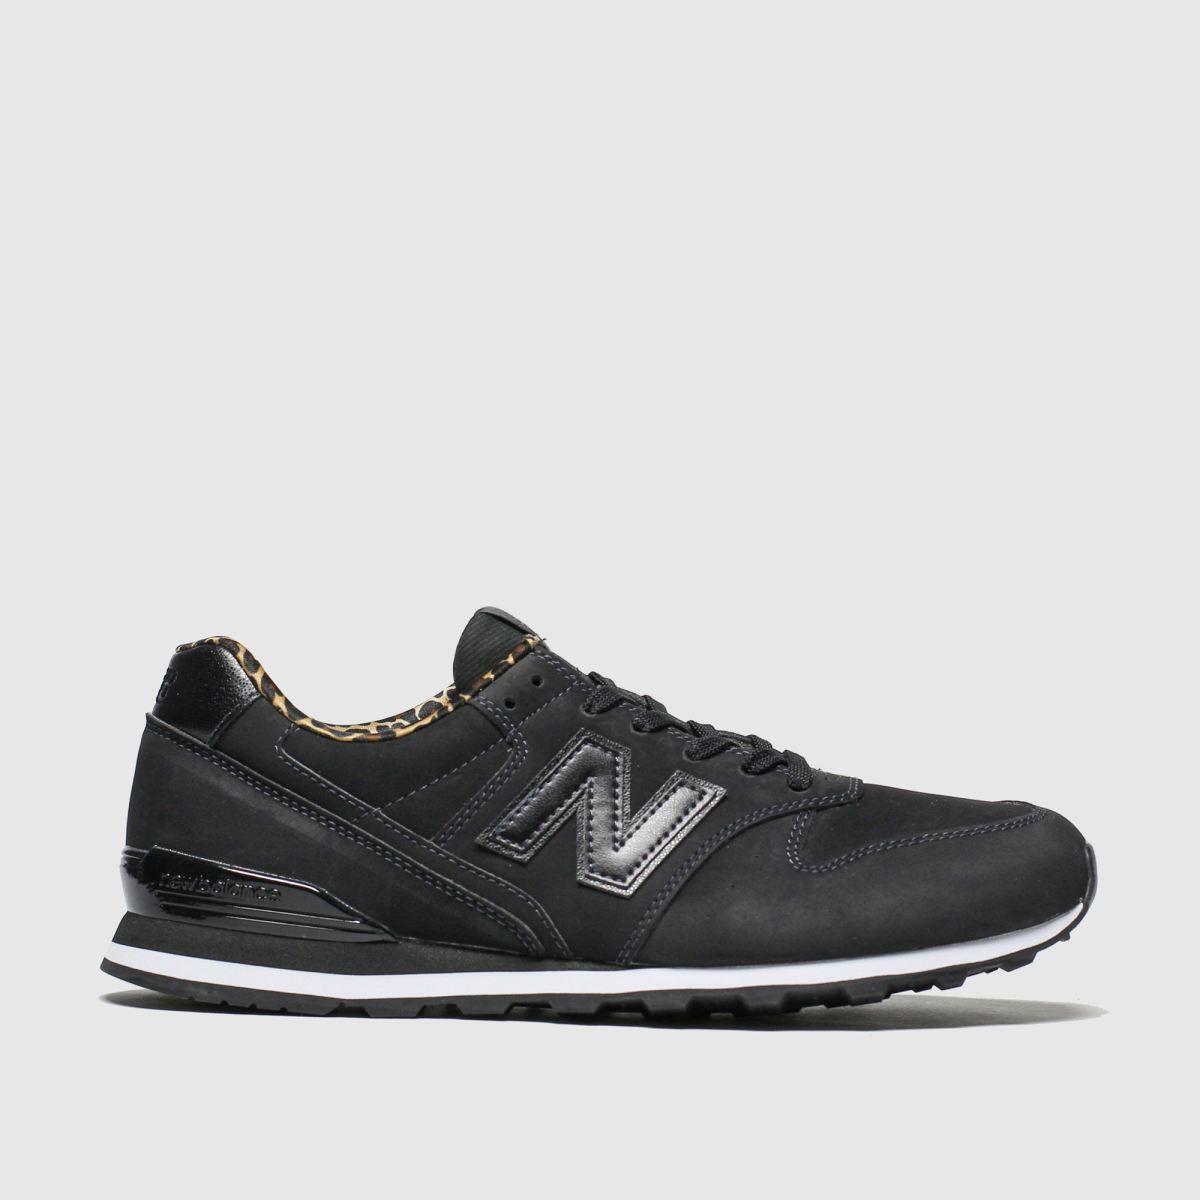 New Balance New Balance Black 996 Trainers